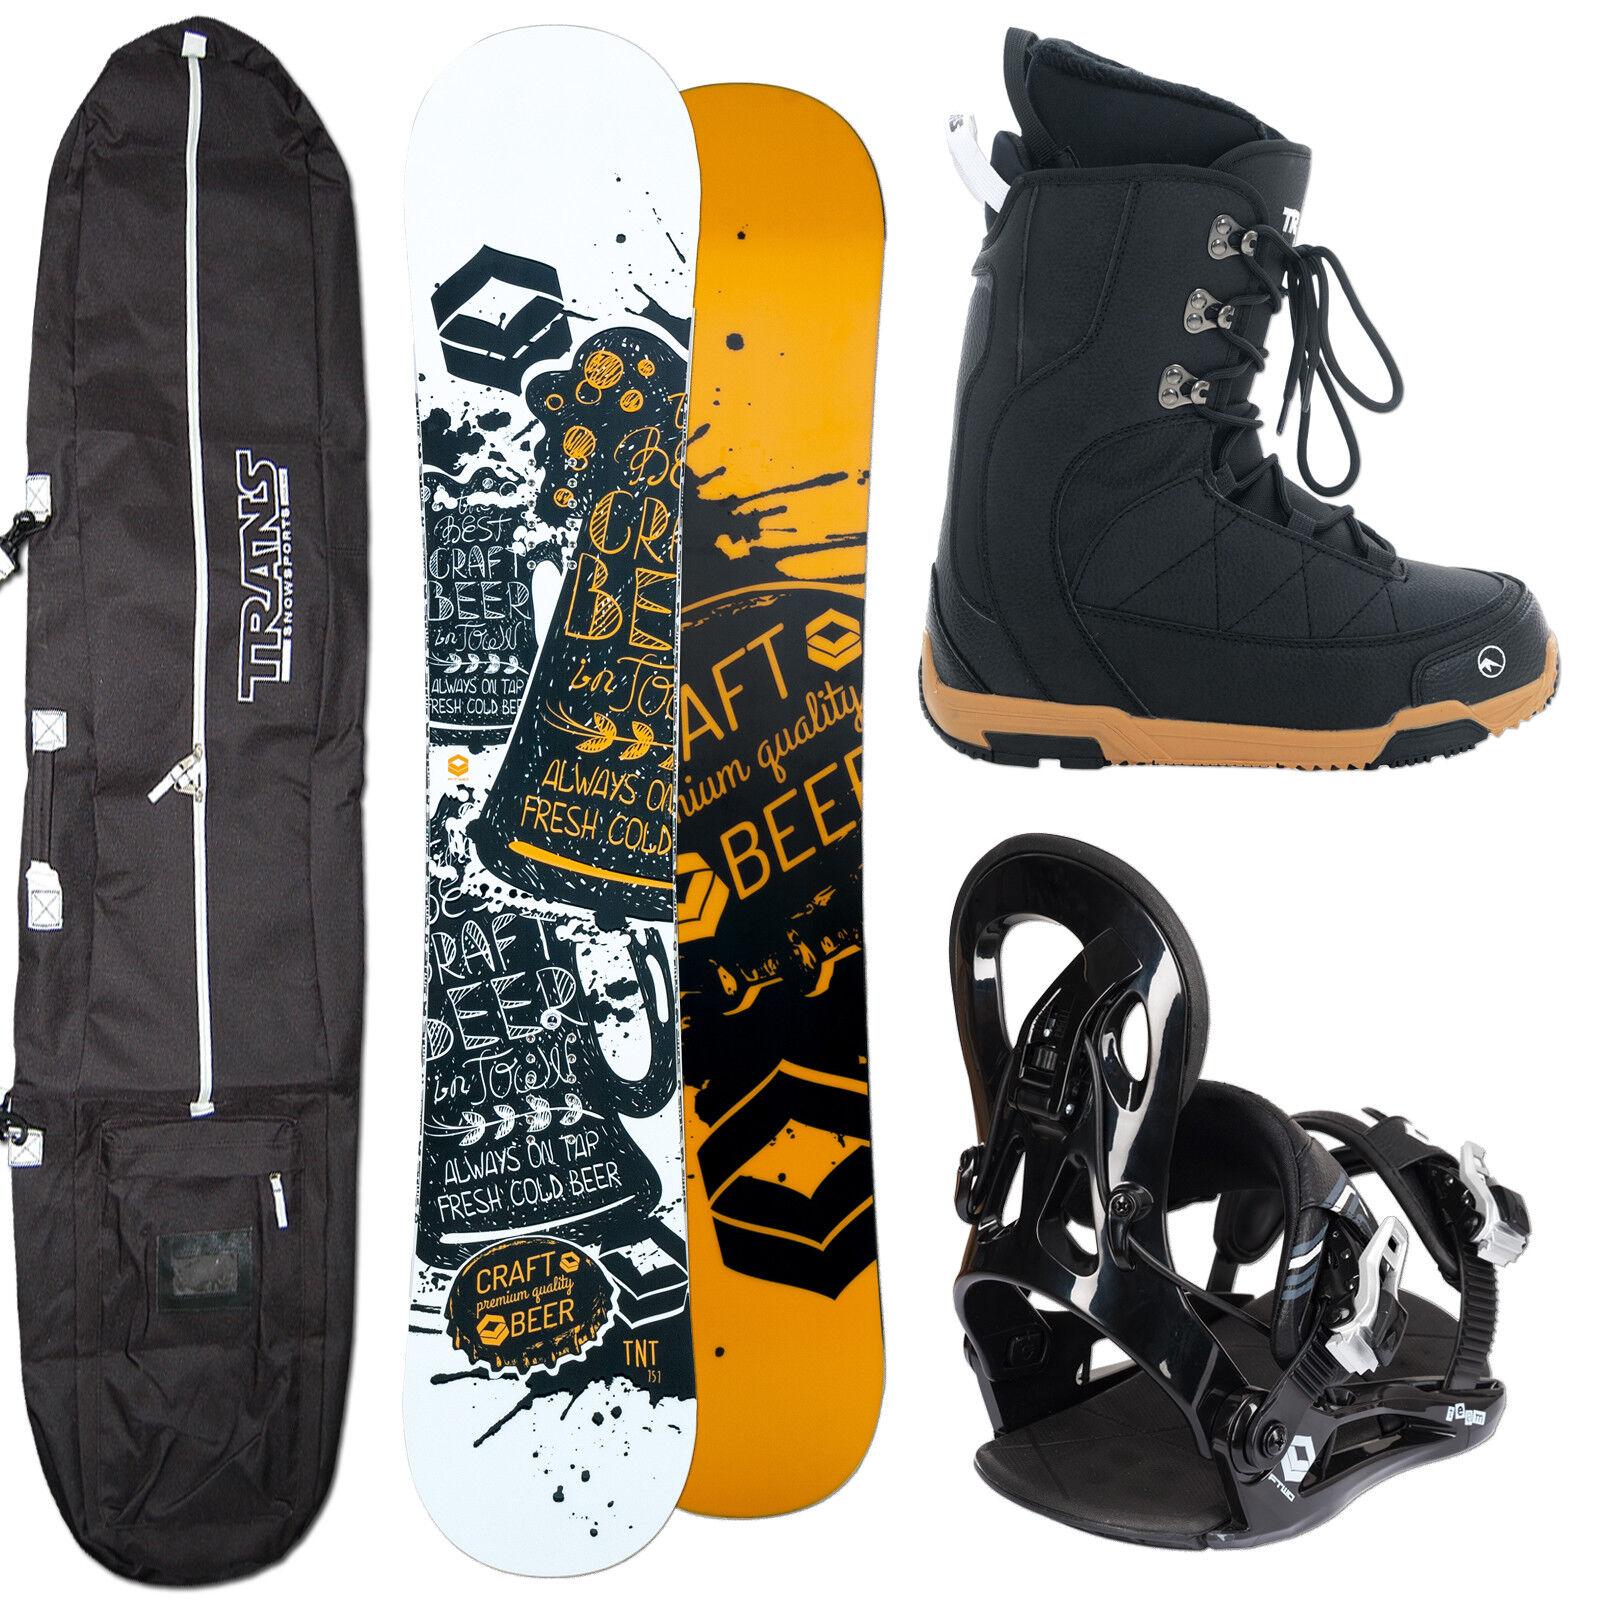 Men's Snowboard Ftwo Tnt orange 143 cm + Fastec Binding SIZE M + Boots+ Bag